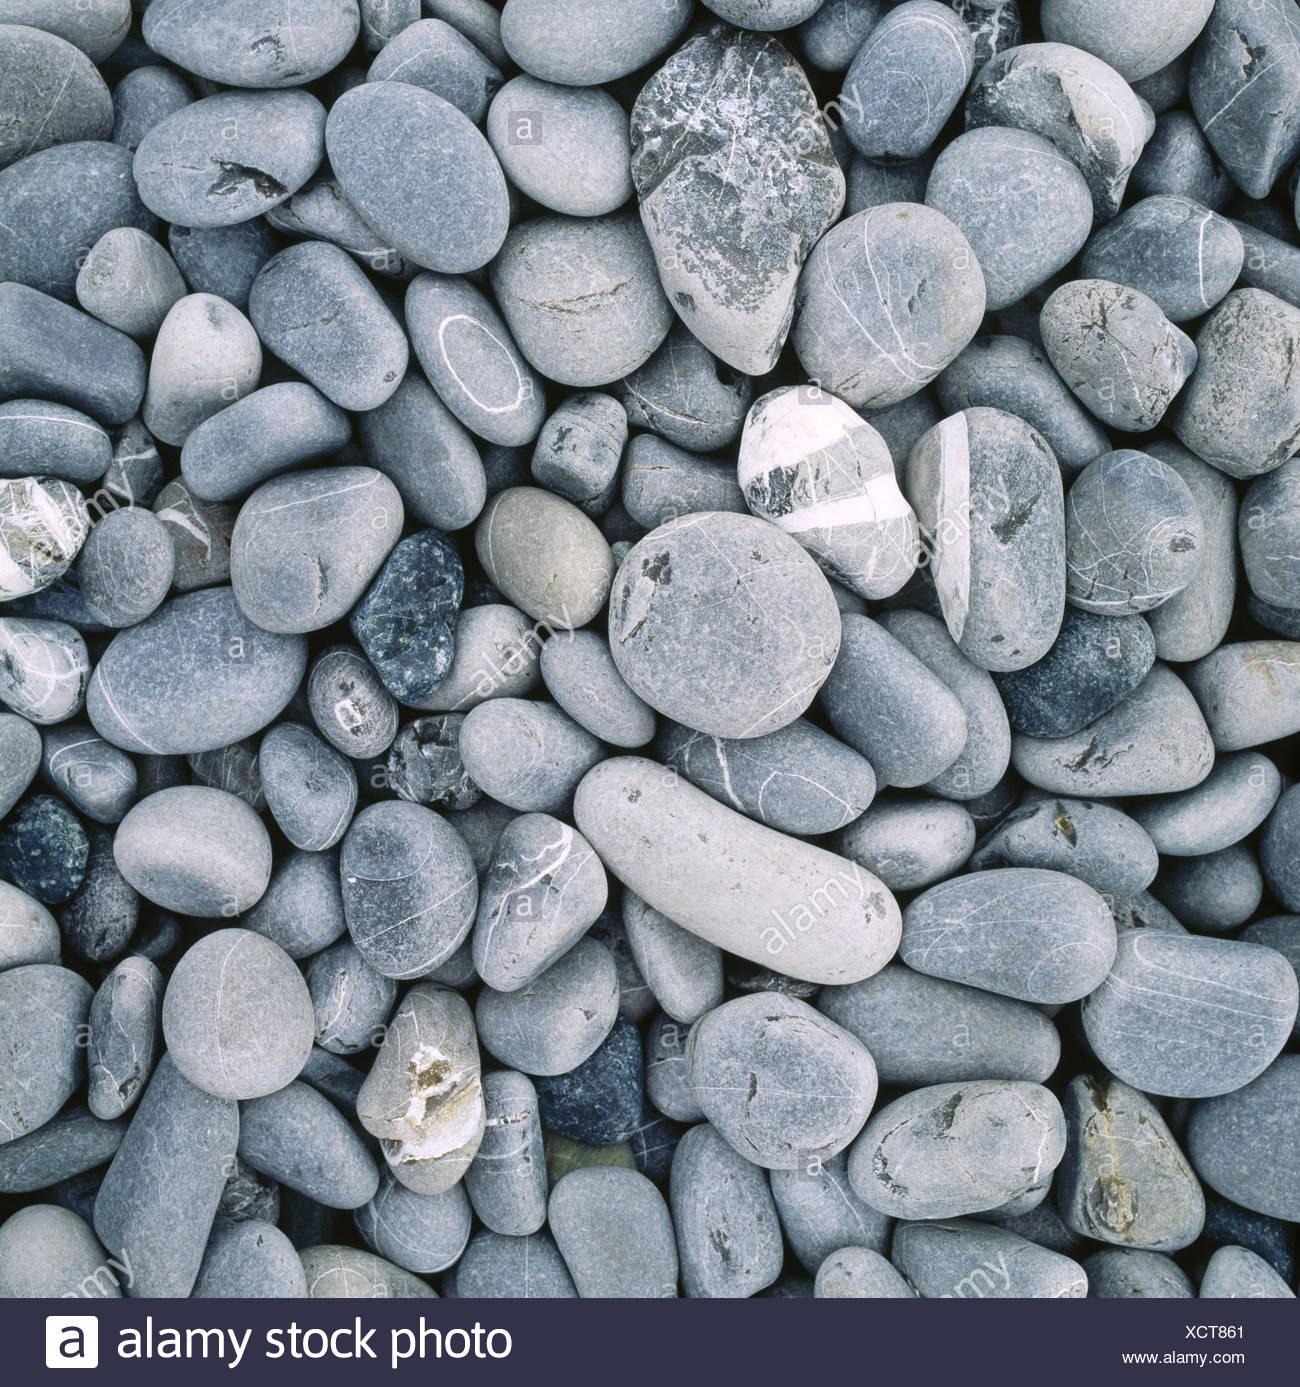 pattern figured gray pebble stones stones structure background Stock Photo